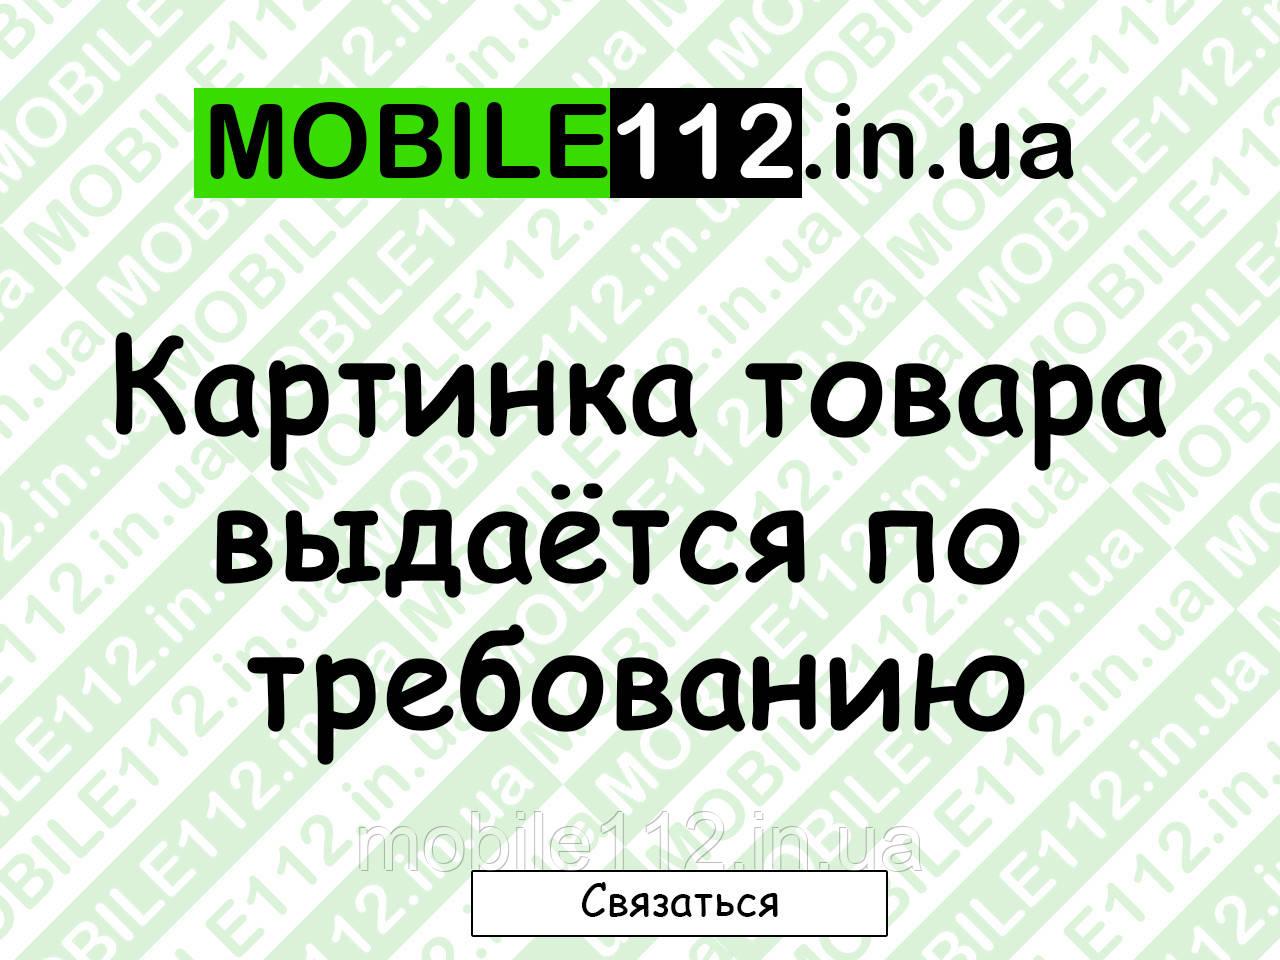 Аккумулятор на Samsung EB-BT230FBT/ EB-BT230FBE, 4000mAh T230/ T231/ T235